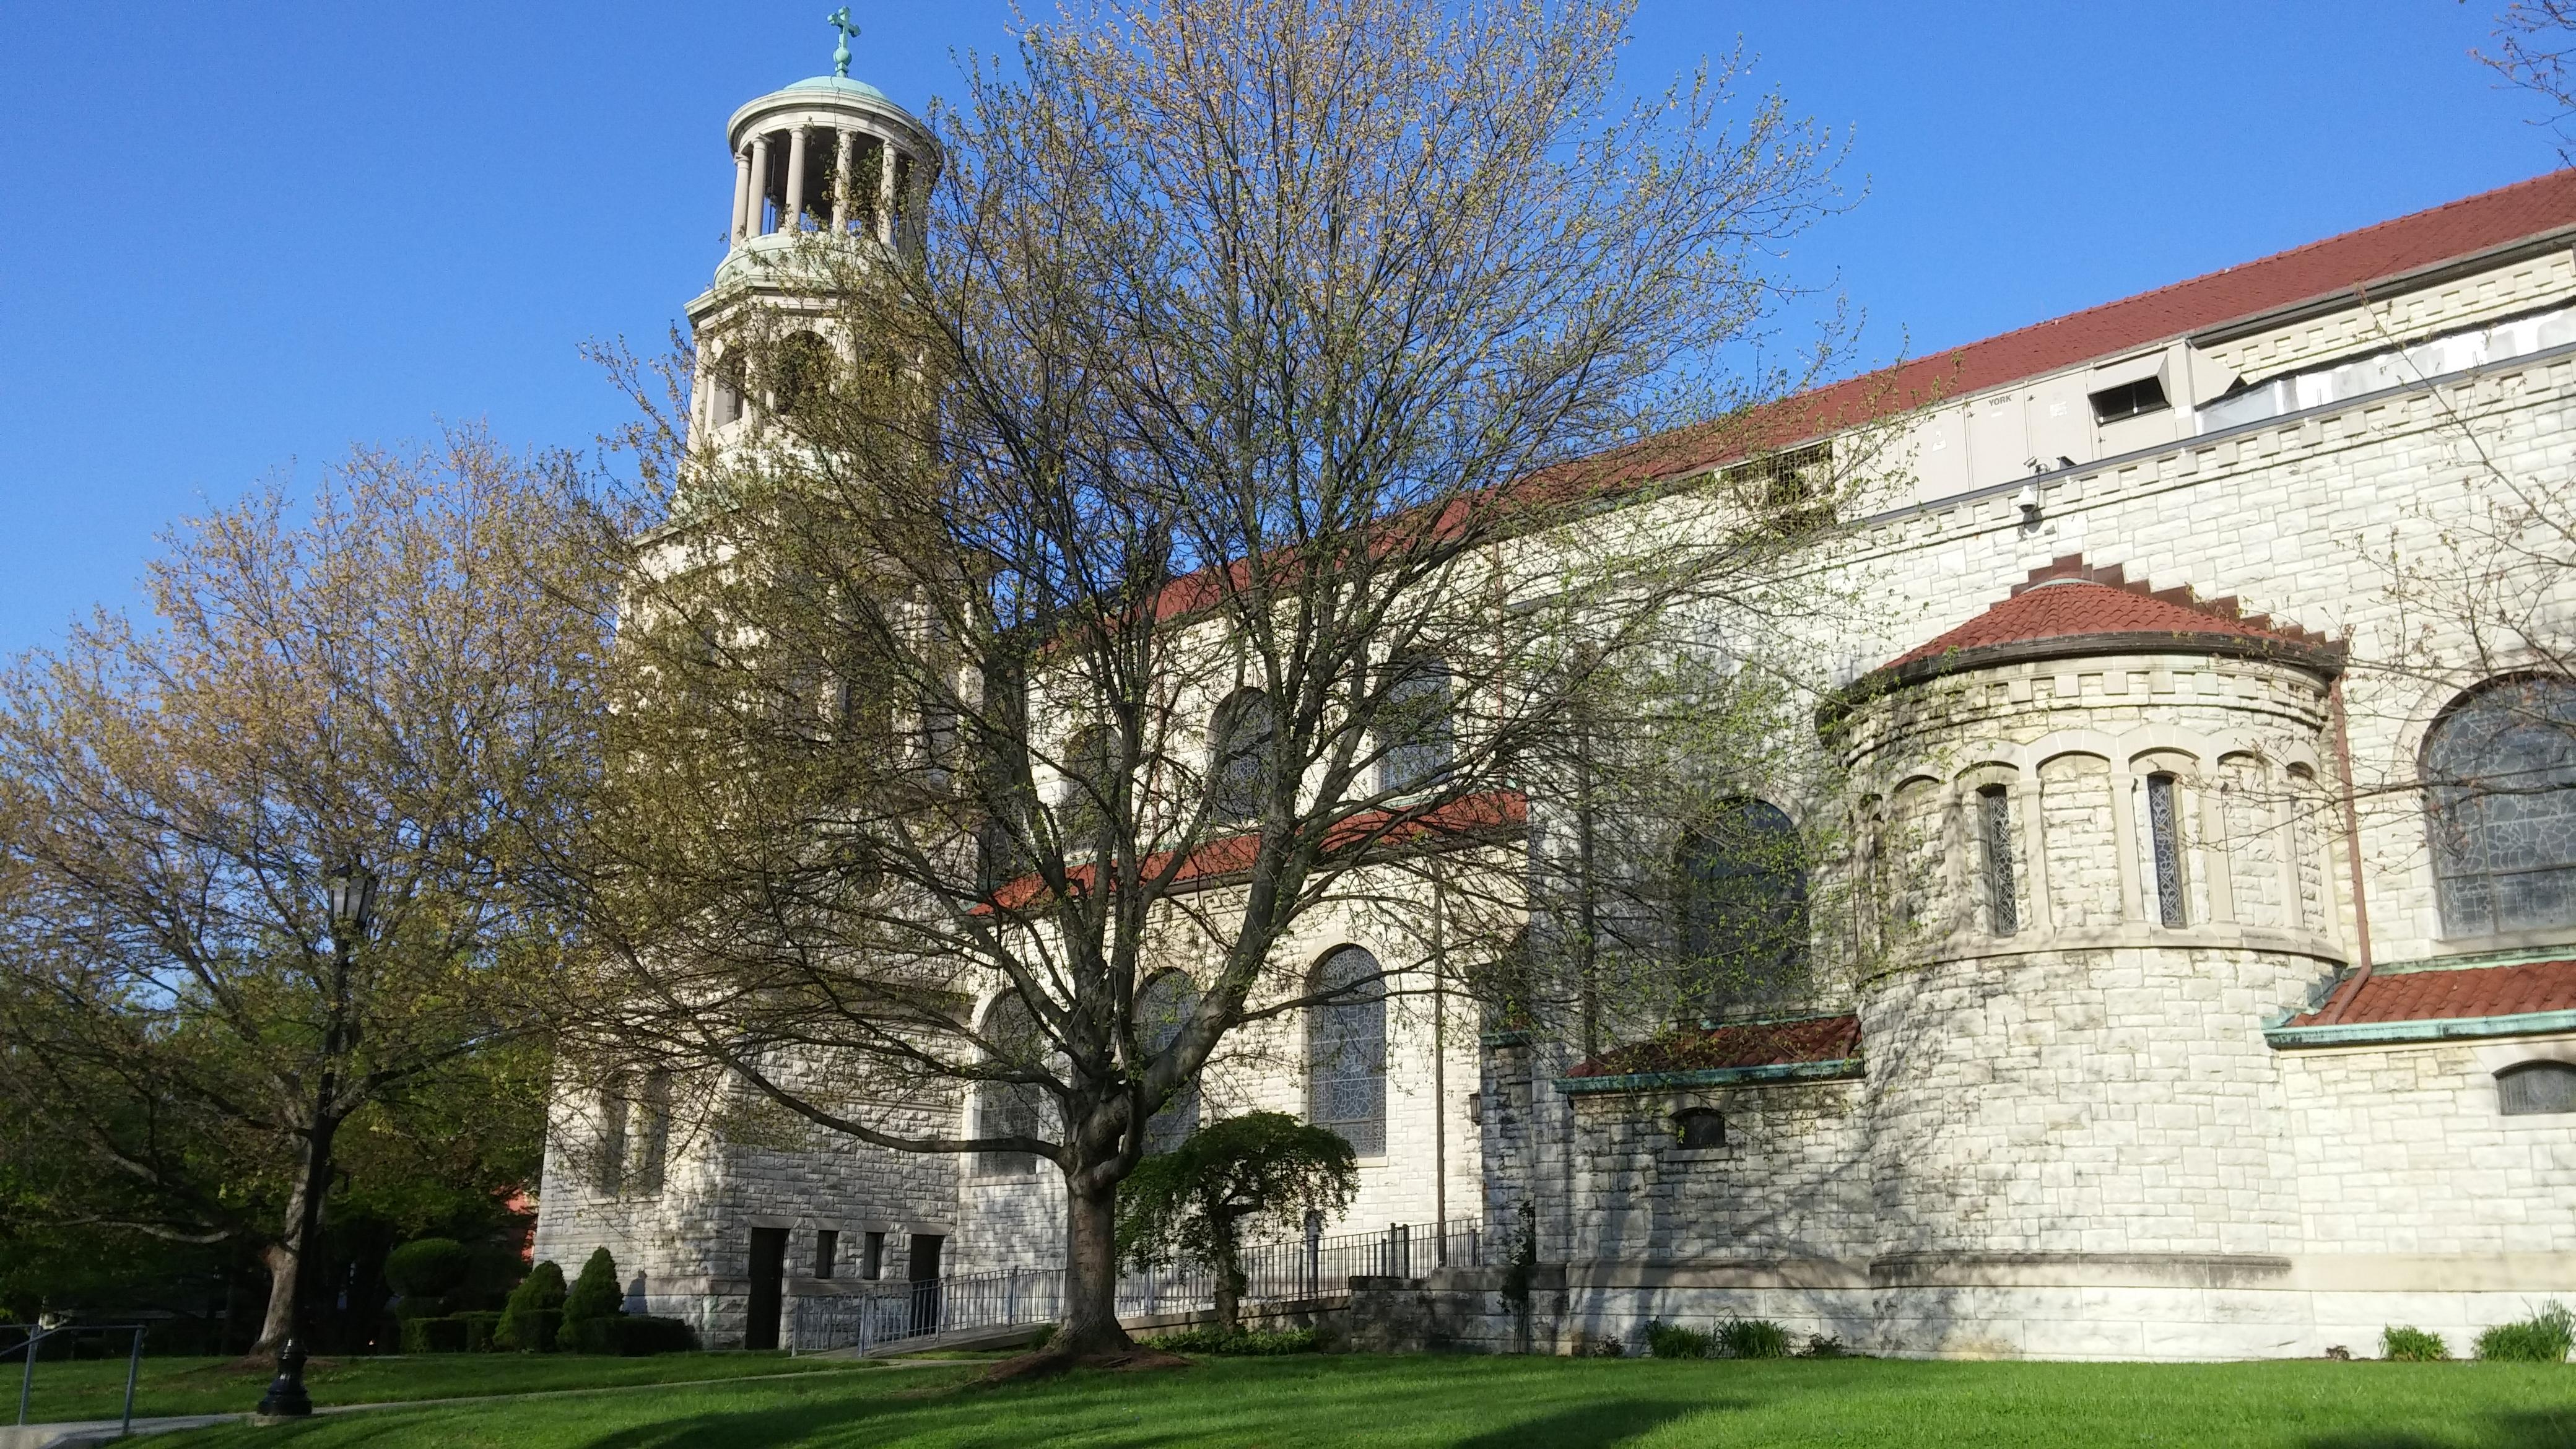 Holy Thursday Morning at St. Boniface Cincinnati (Greg Hartman/CT Photo)